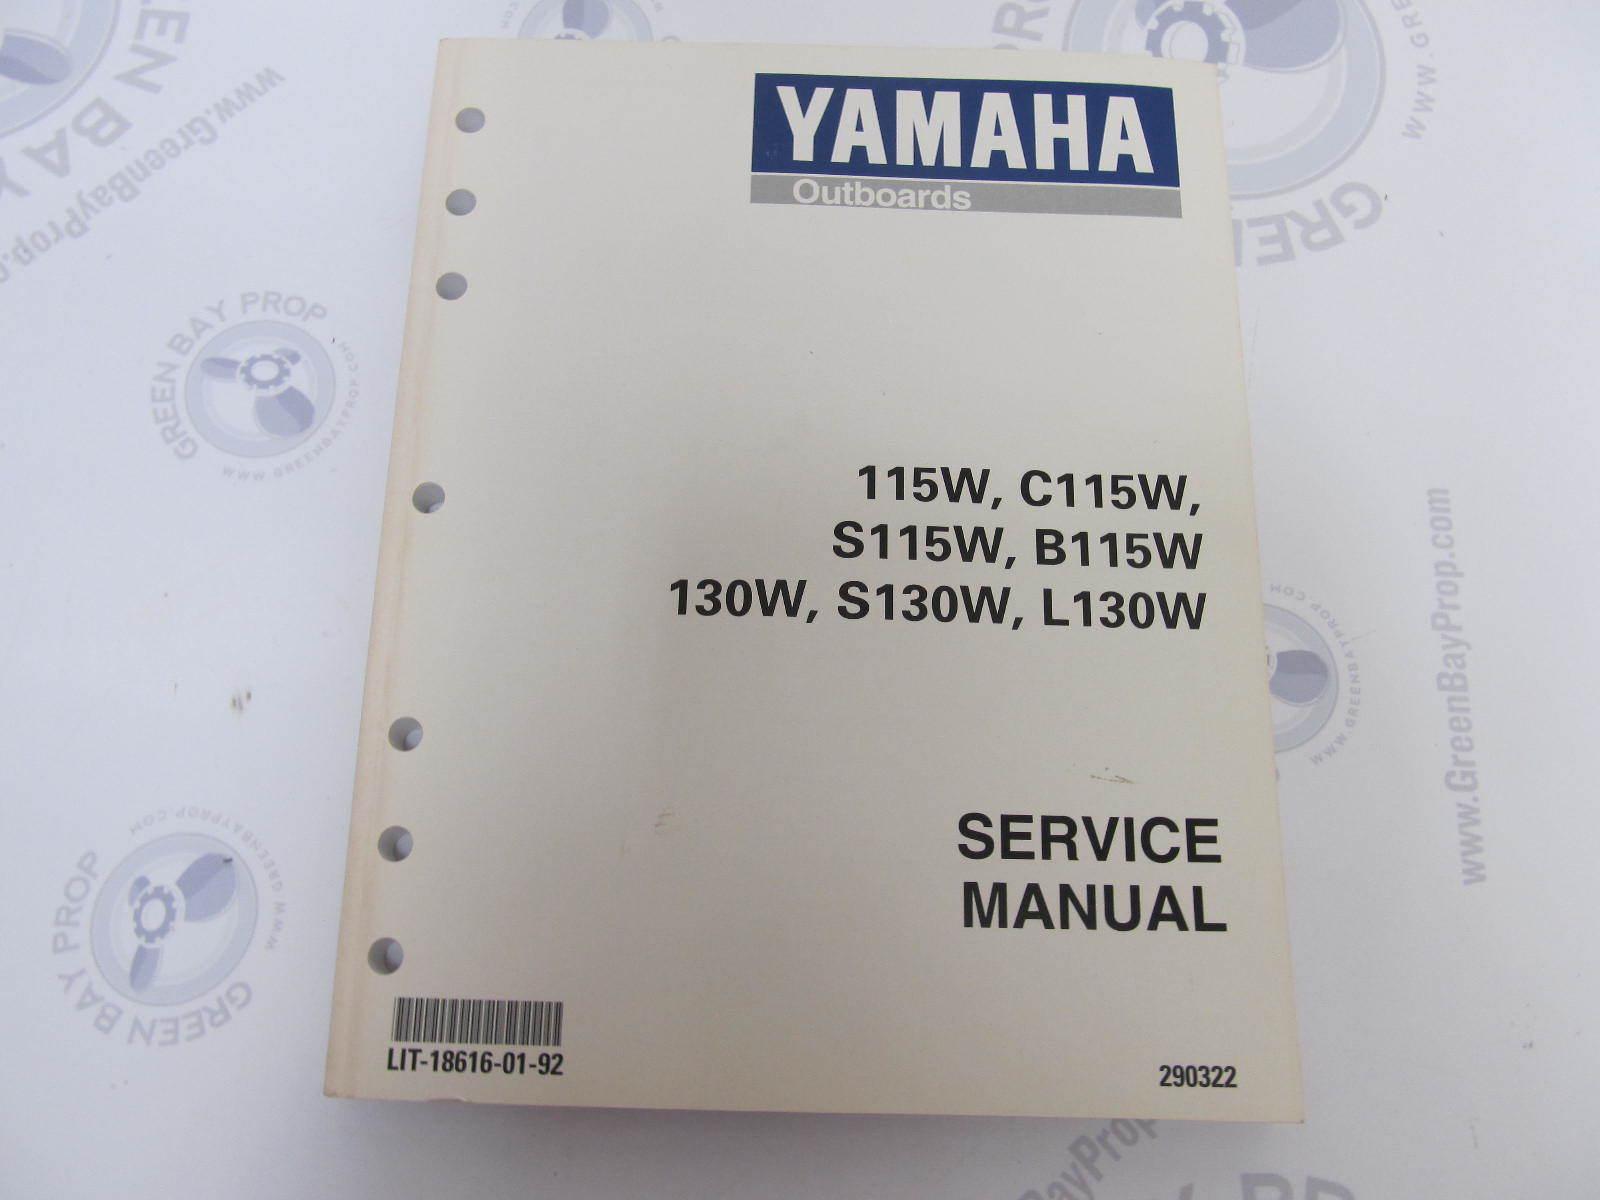 Yamaha 115 Hp outboard Manual Weight 90